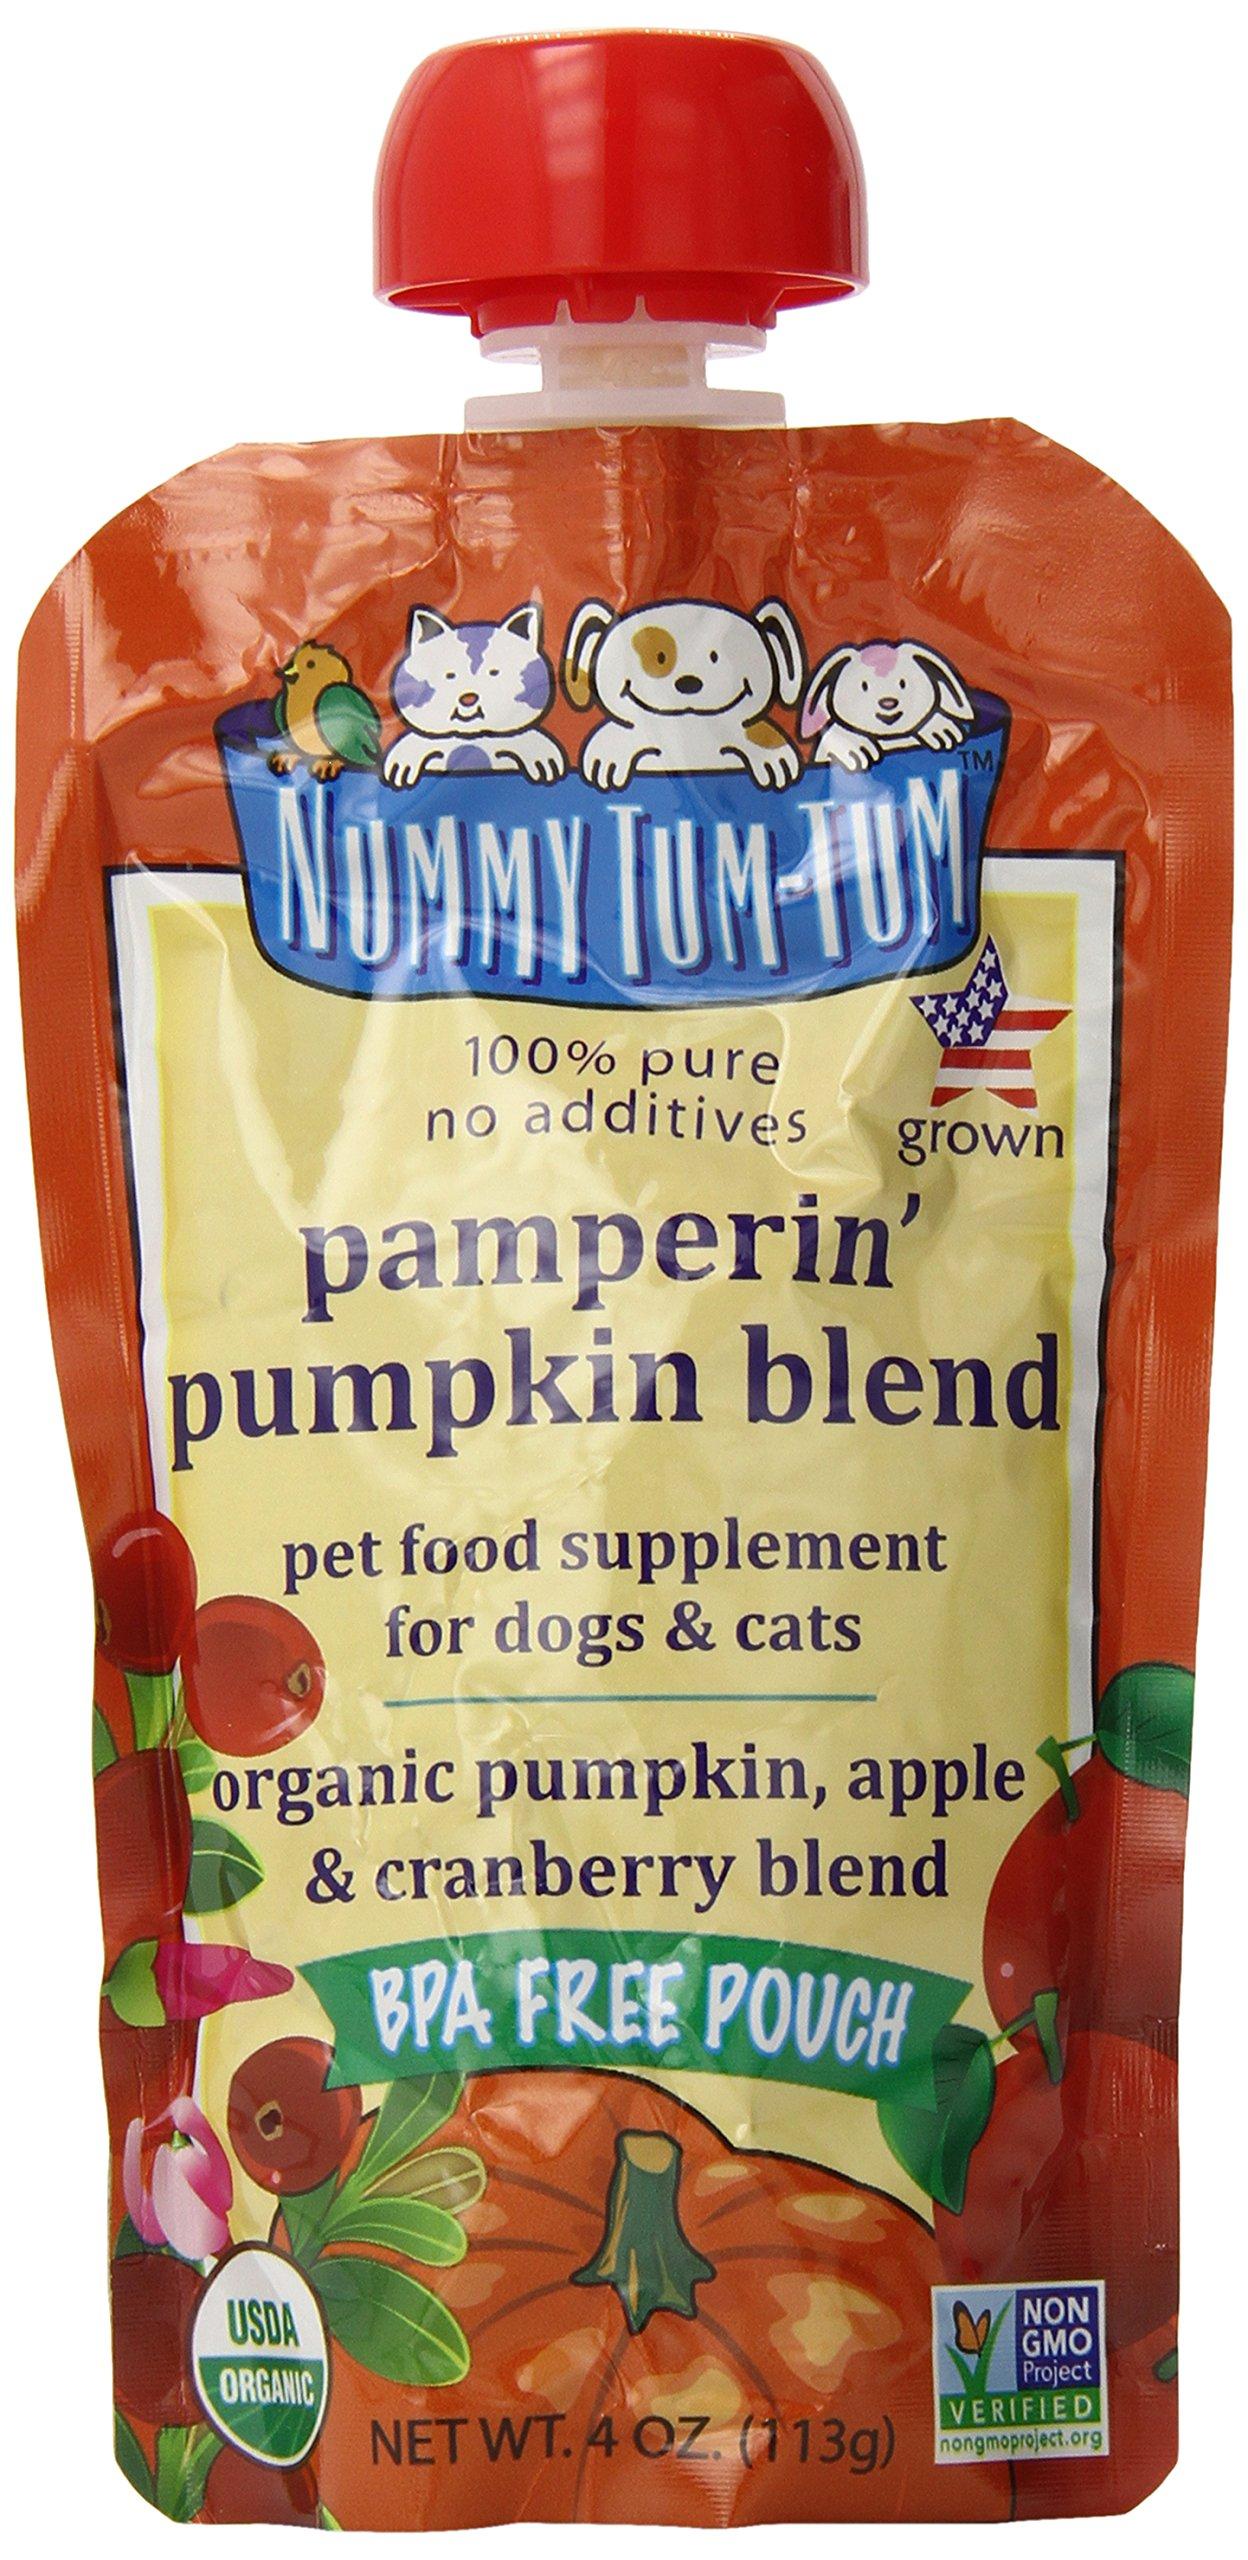 Nummy Tum Tum Organic Pampering Pumpkin Blend, 4 Ounce (Pack of 12)